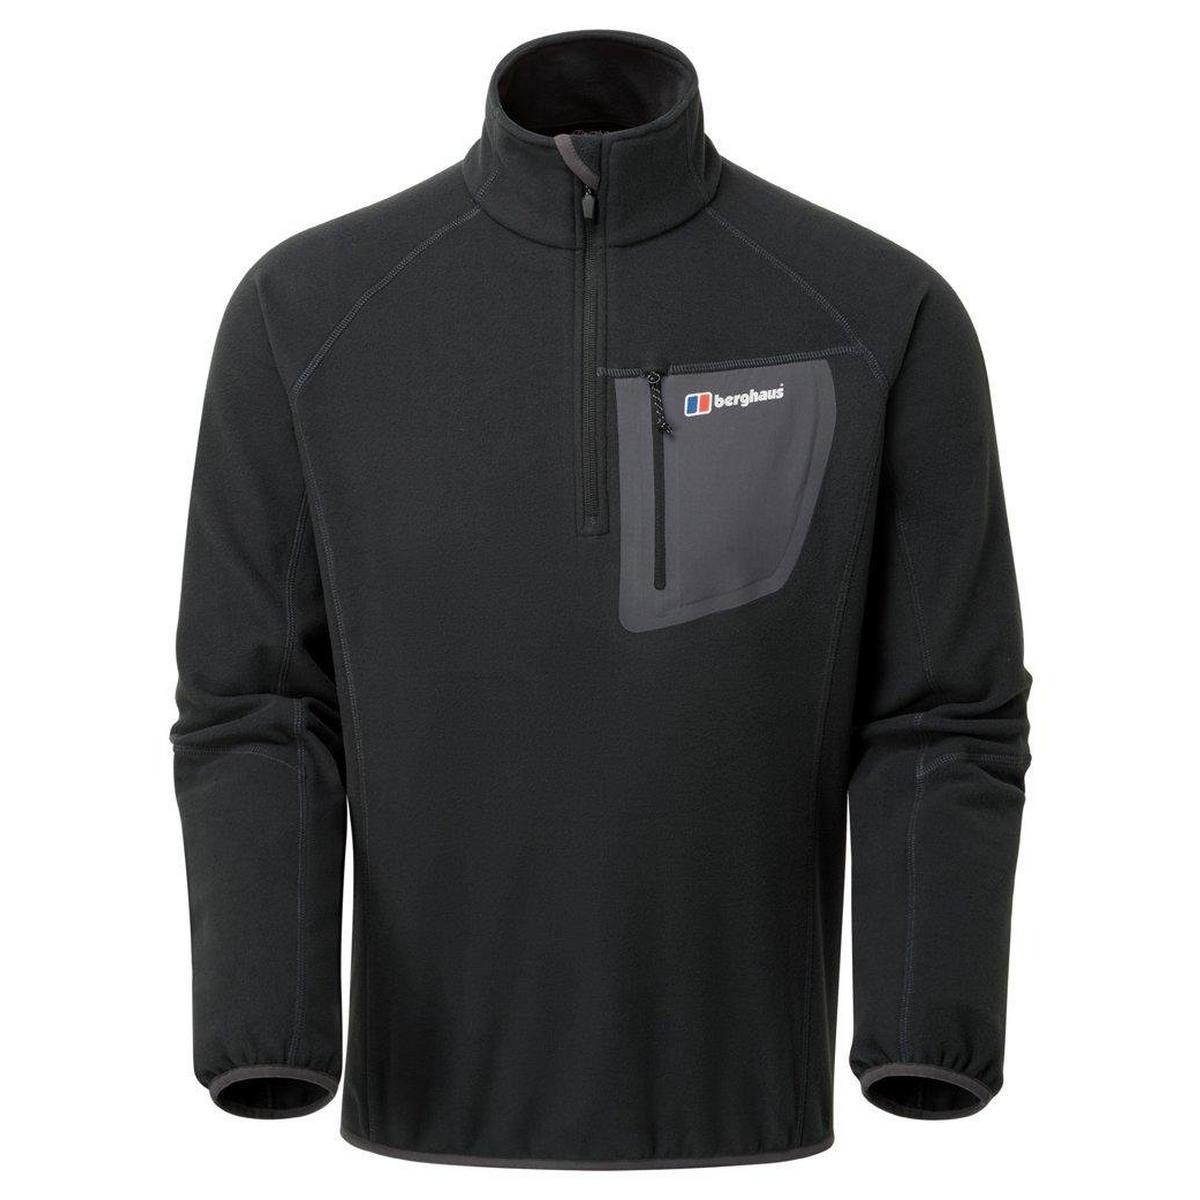 Berghaus Men's Berghaus Kedron Half Zip Fleece - Black